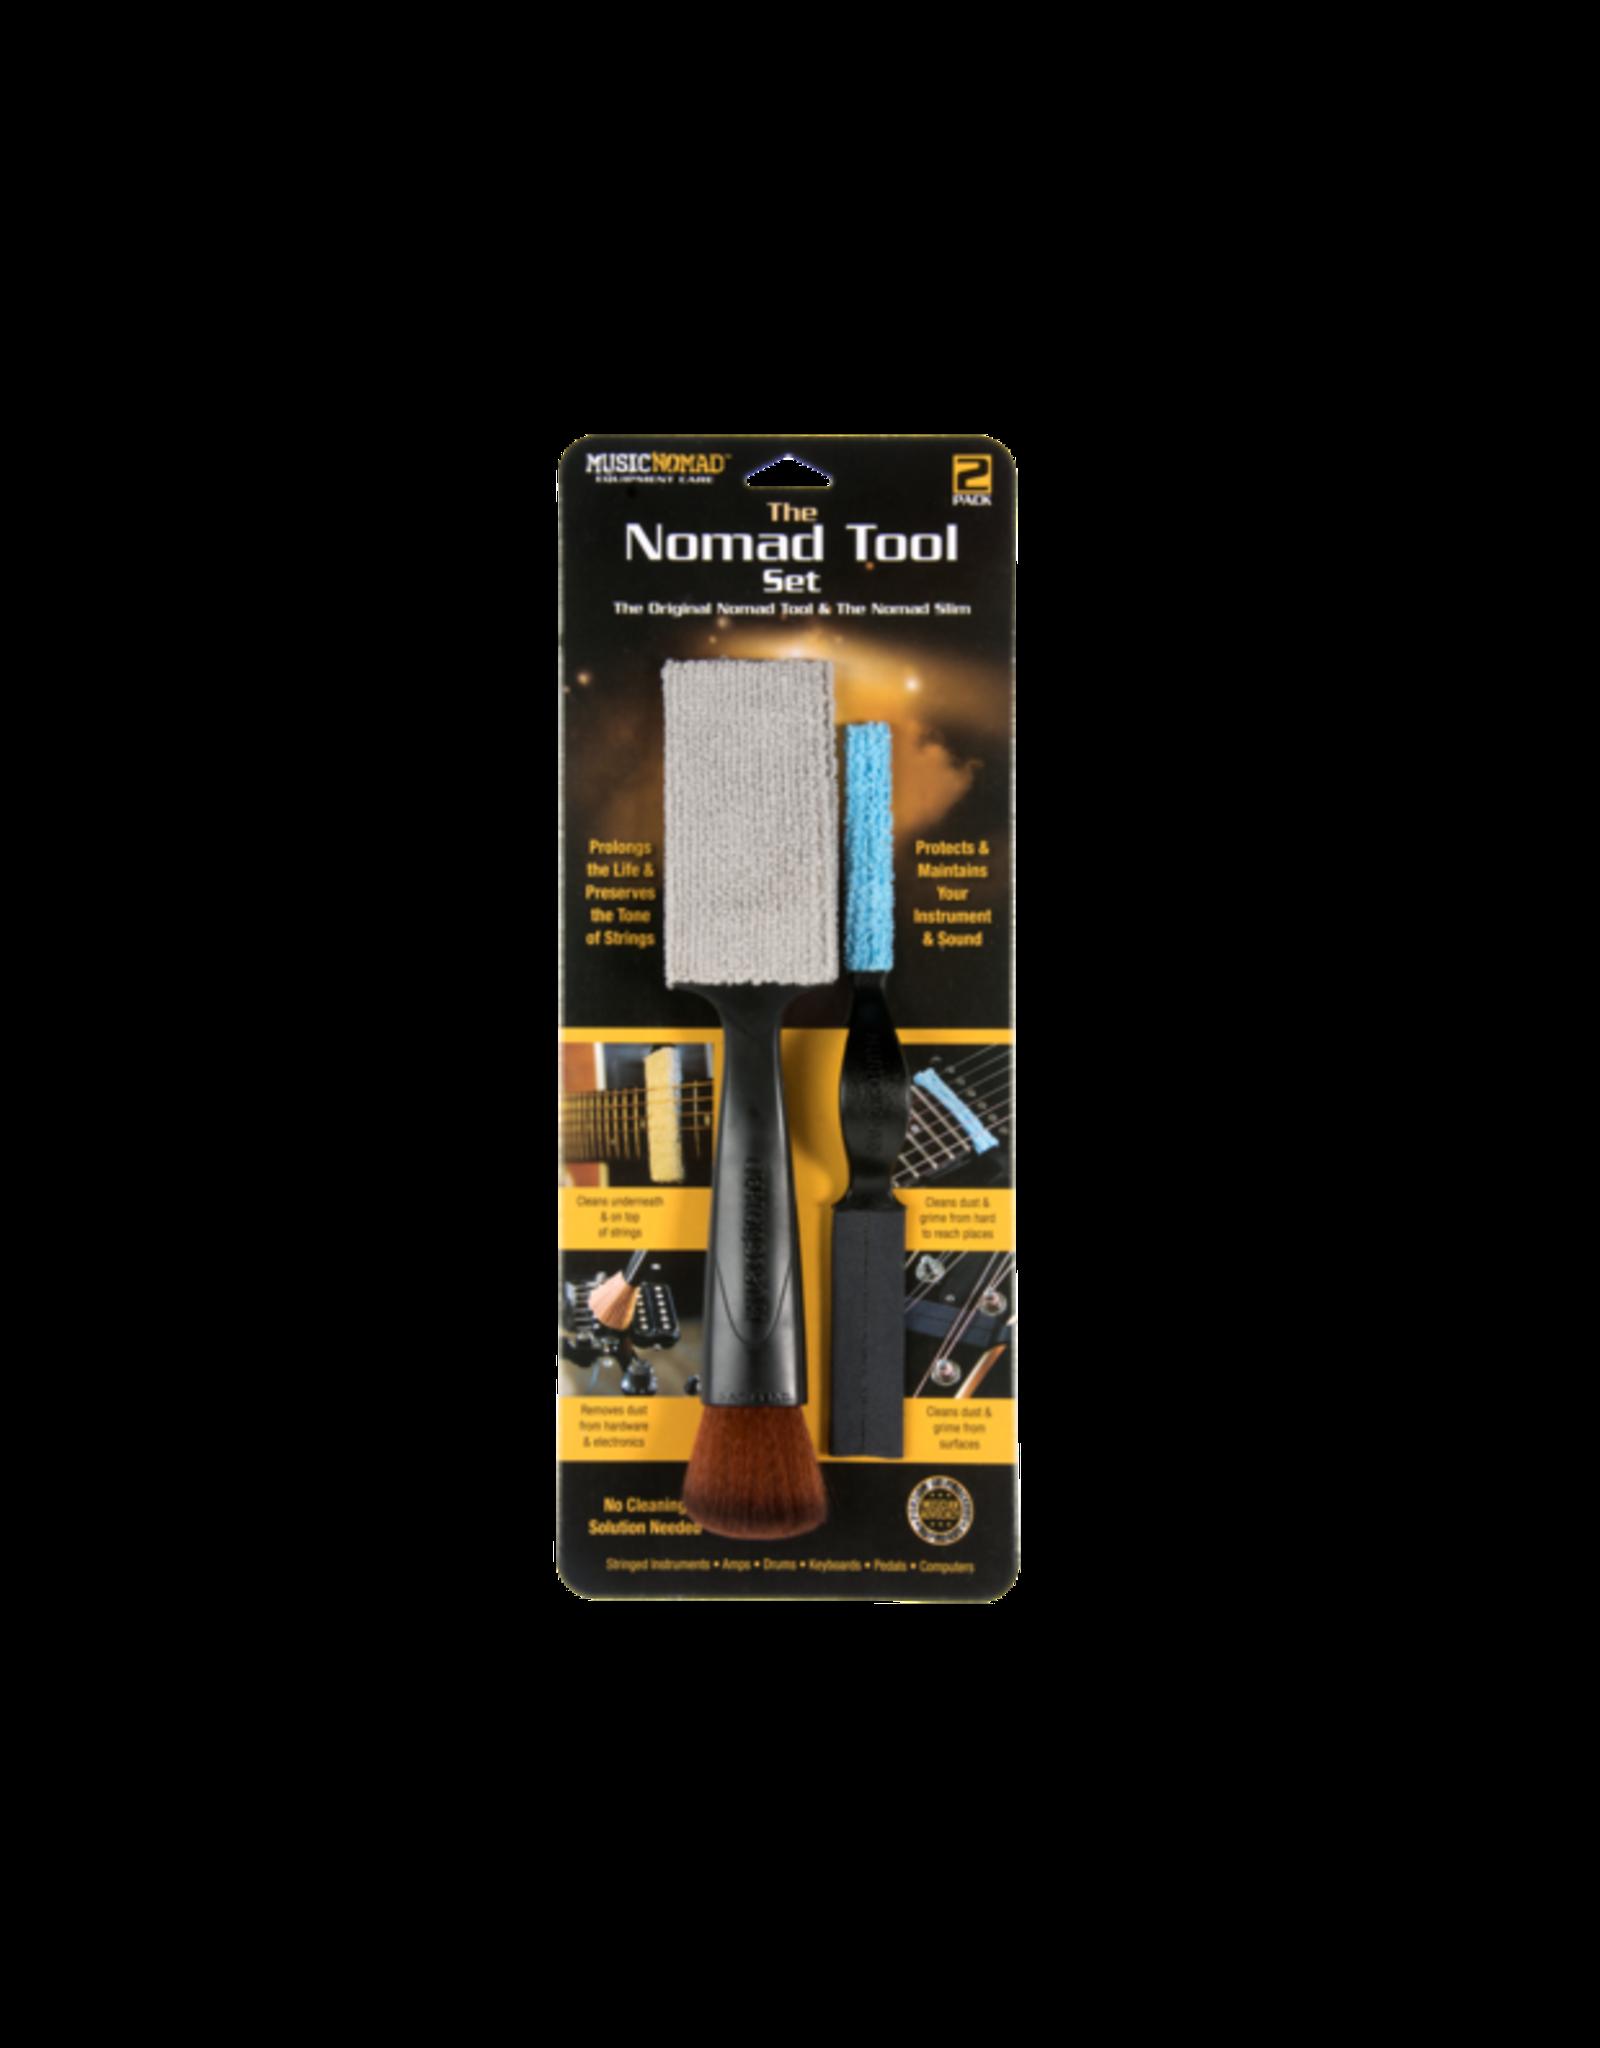 Music Nomad Music Nomad The Nomad Tool Set - The Original Nomad Tool & The Nomad Slim